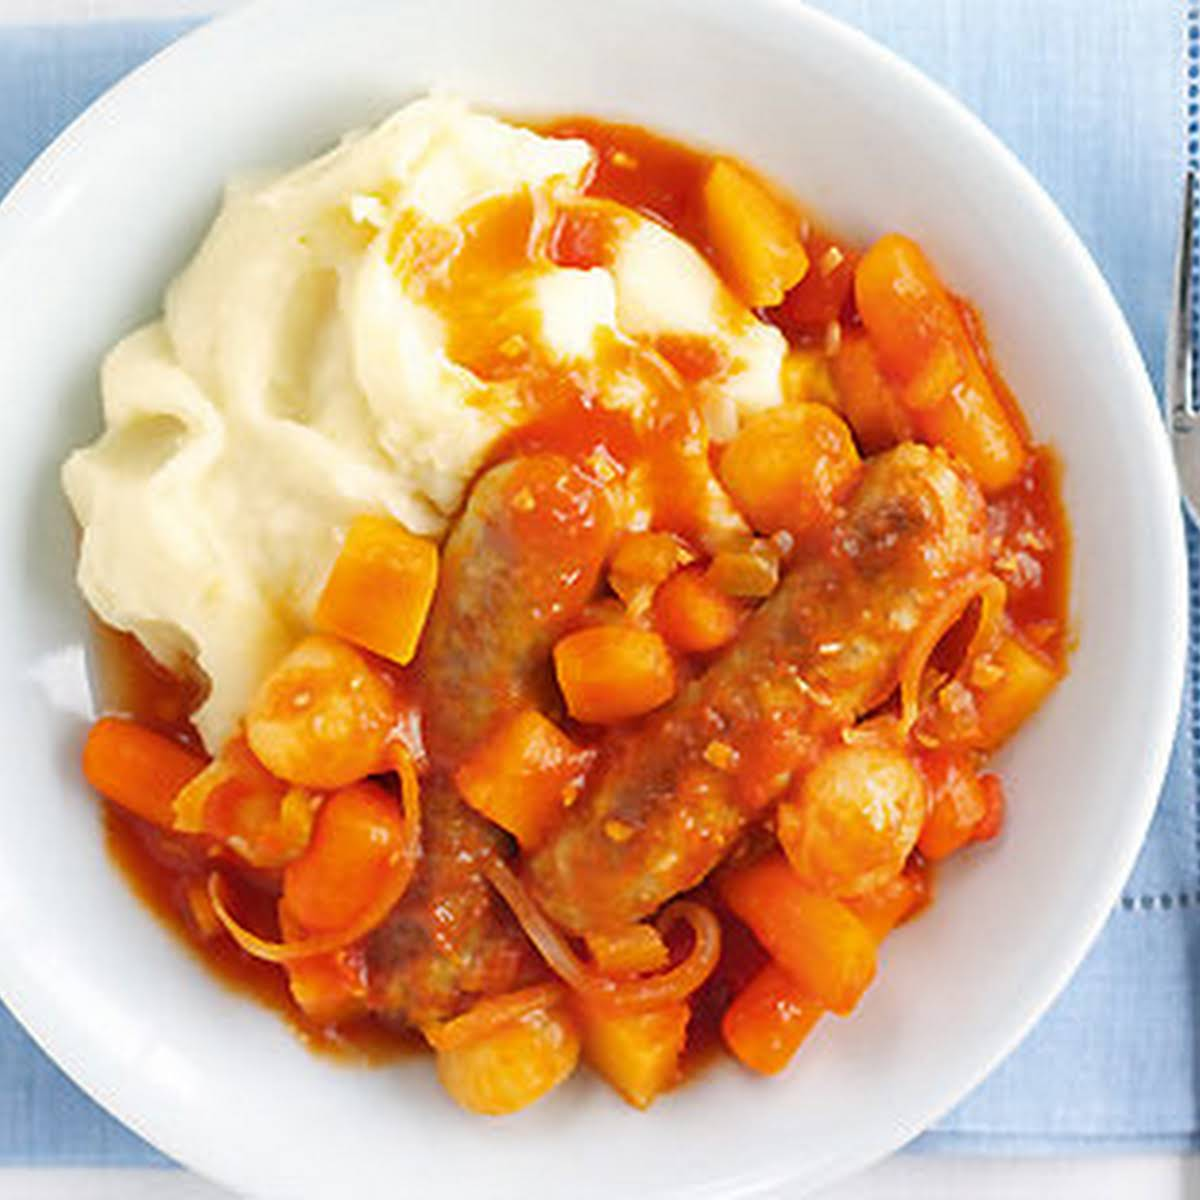 affable Sausage Casserole